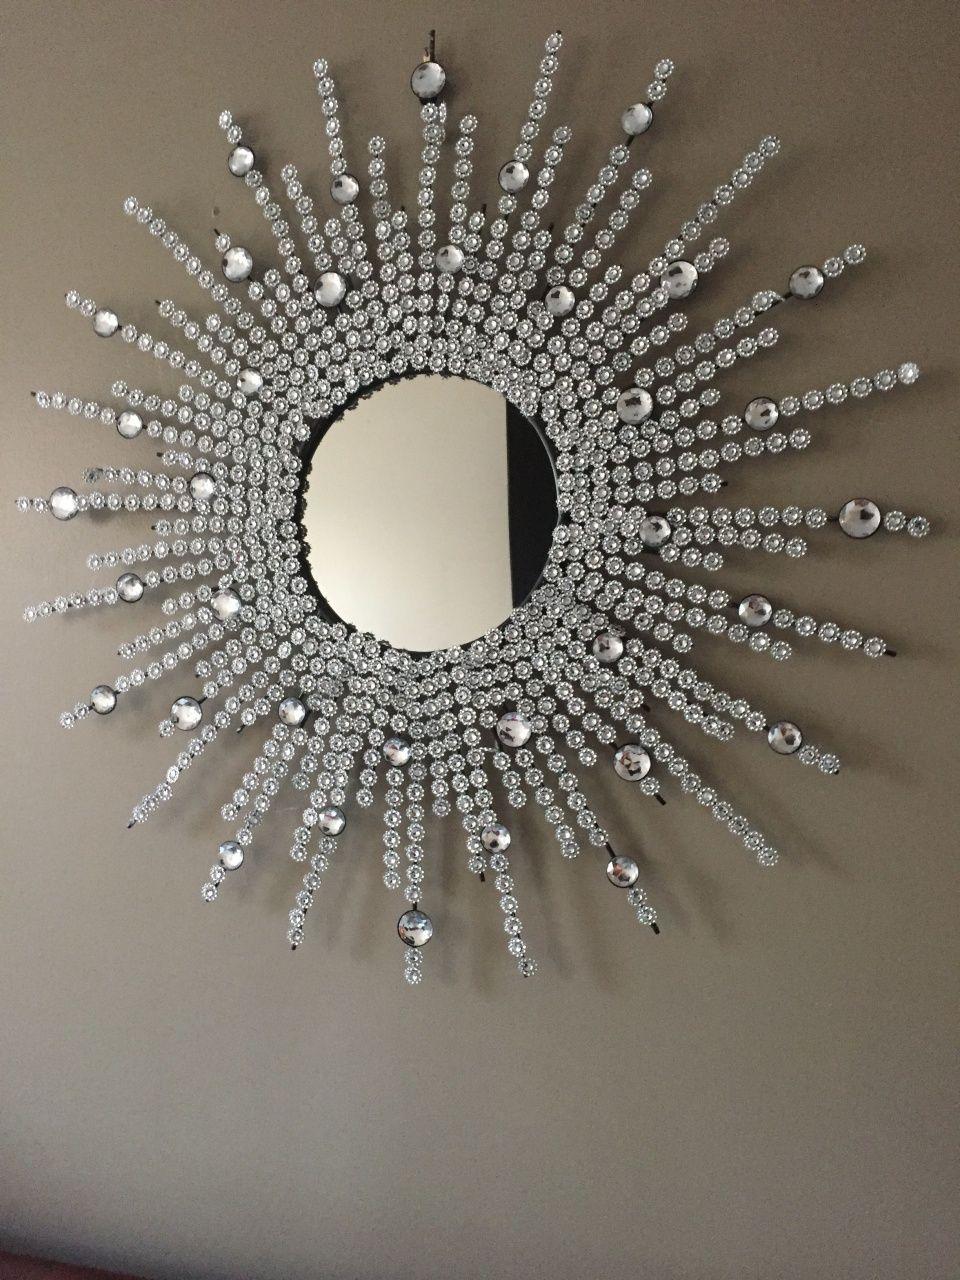 Bubble Mirror Wall Art Di 2020 Cermin Dinding Dekorasi Dinding Buatan Sendiri Dekorasi Dinding